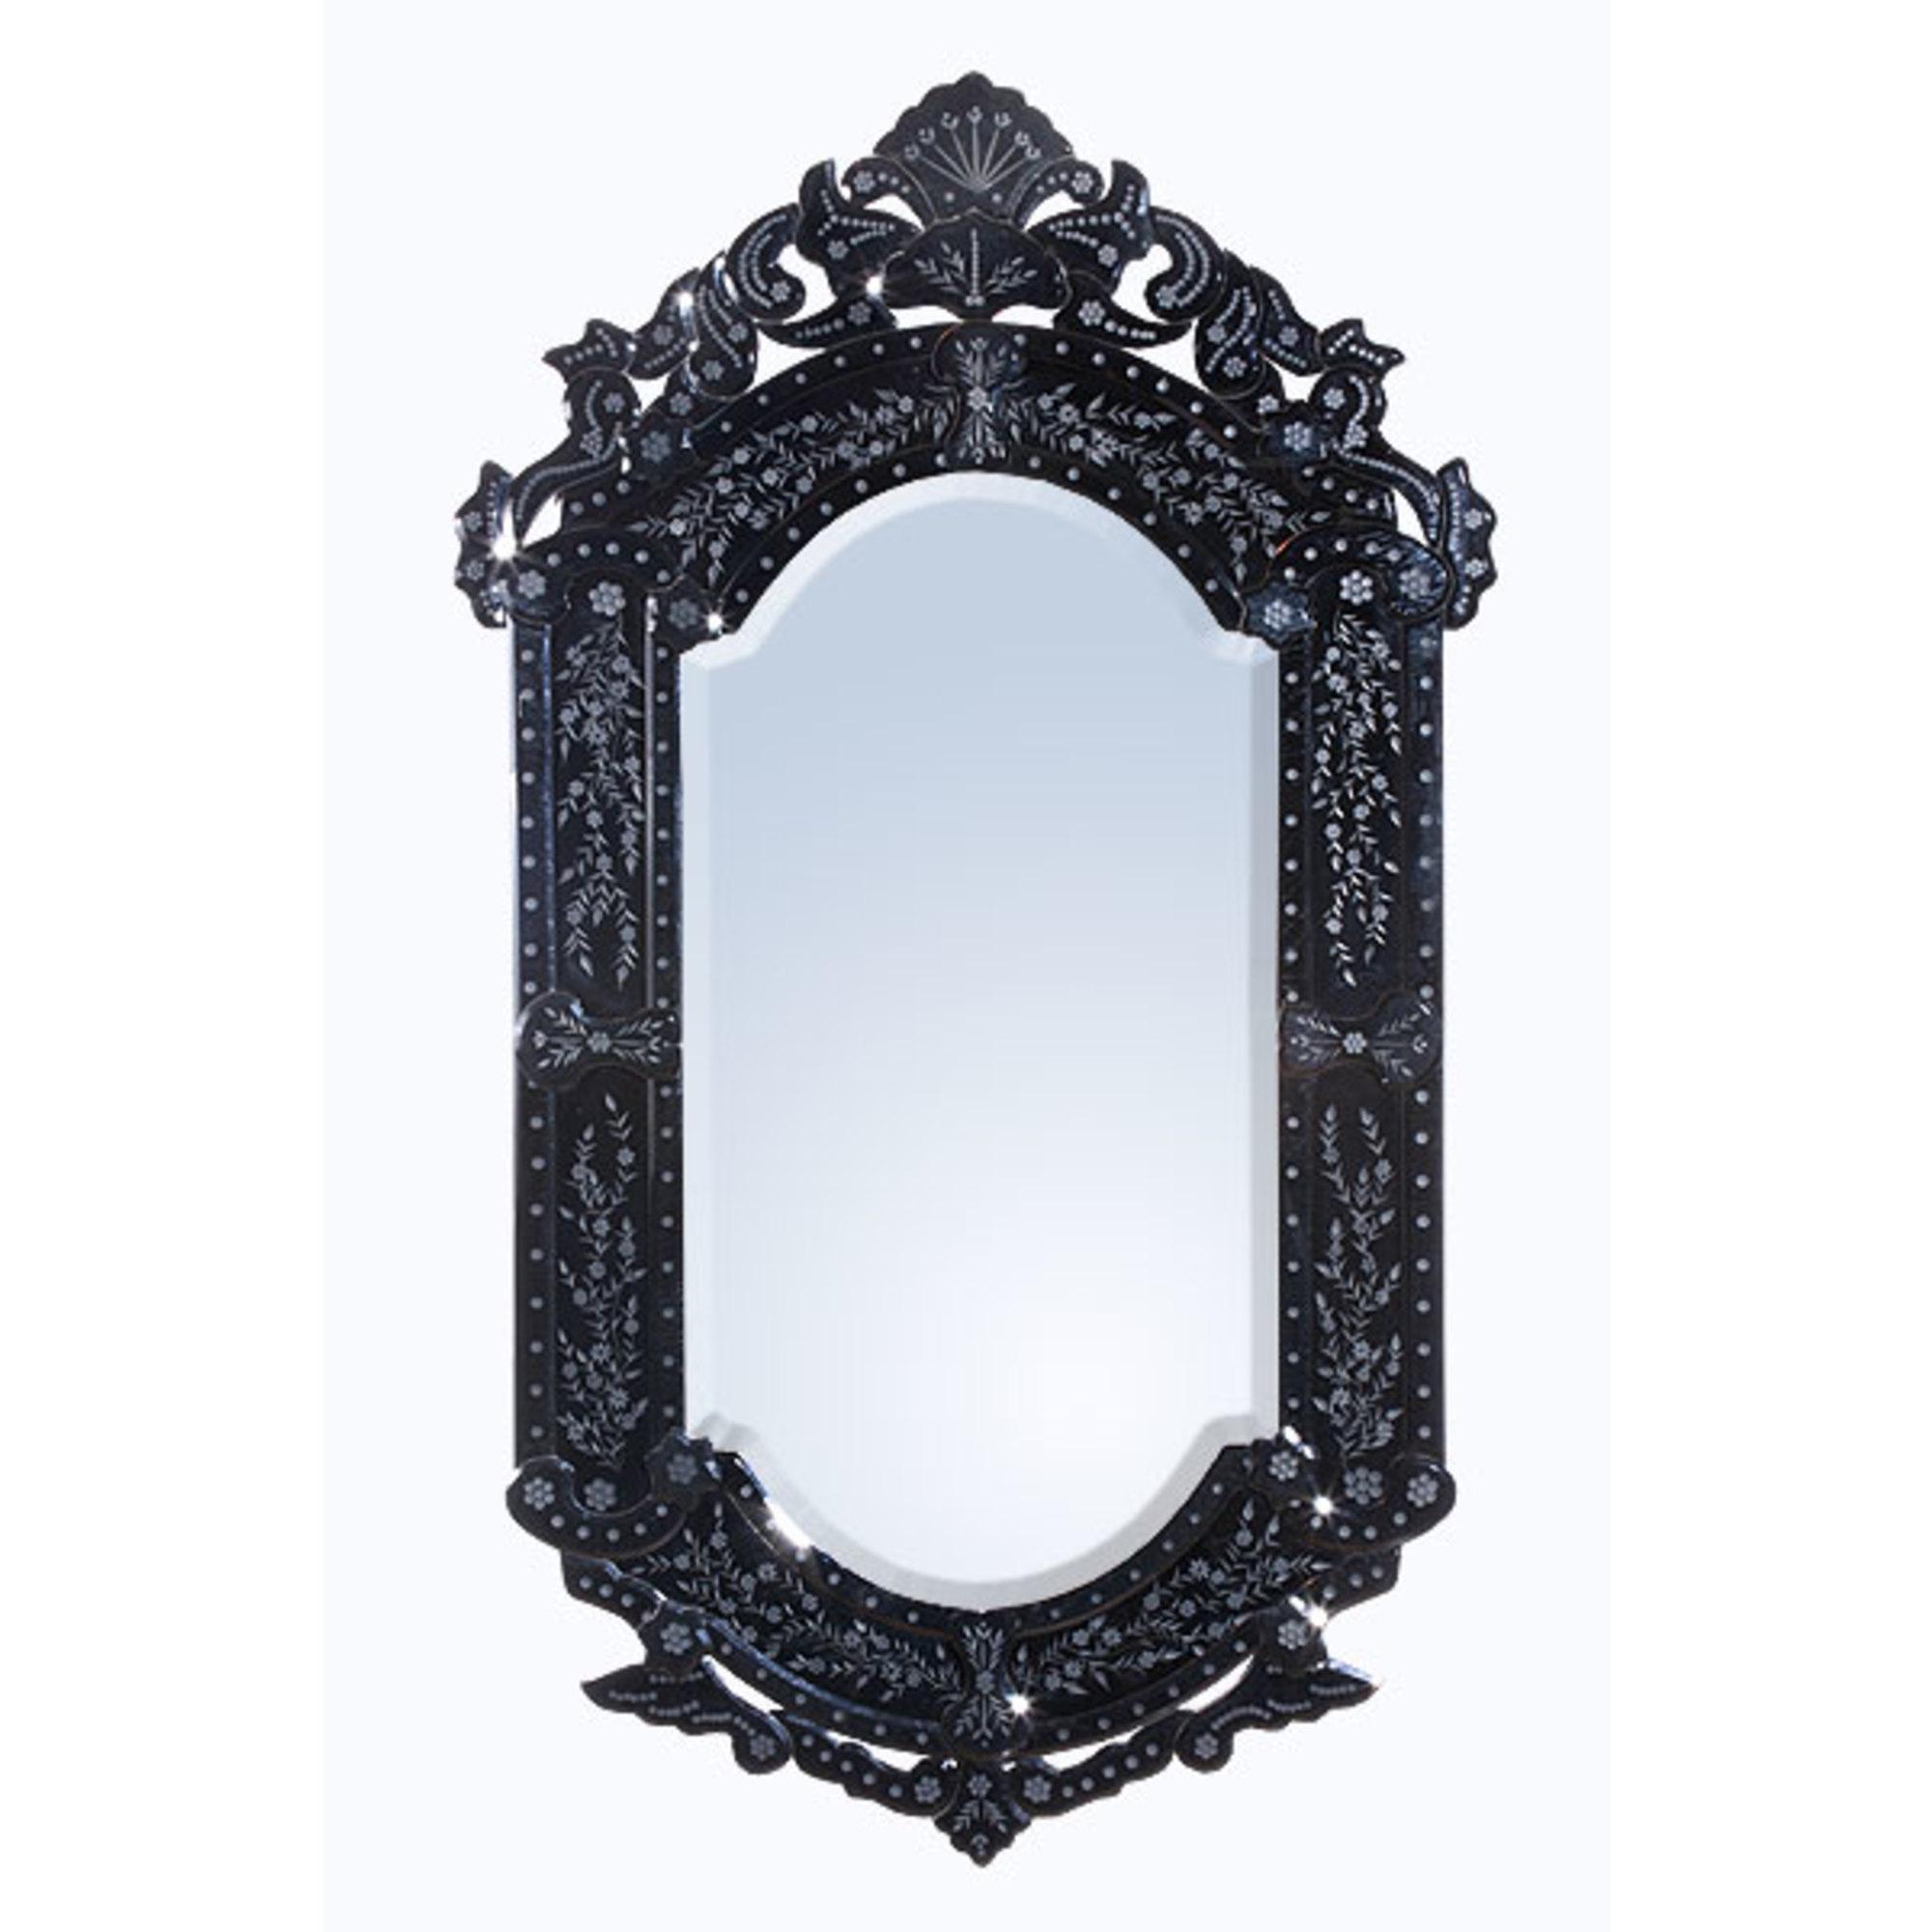 Vintage Venezia Etched Wall Mirror - Black